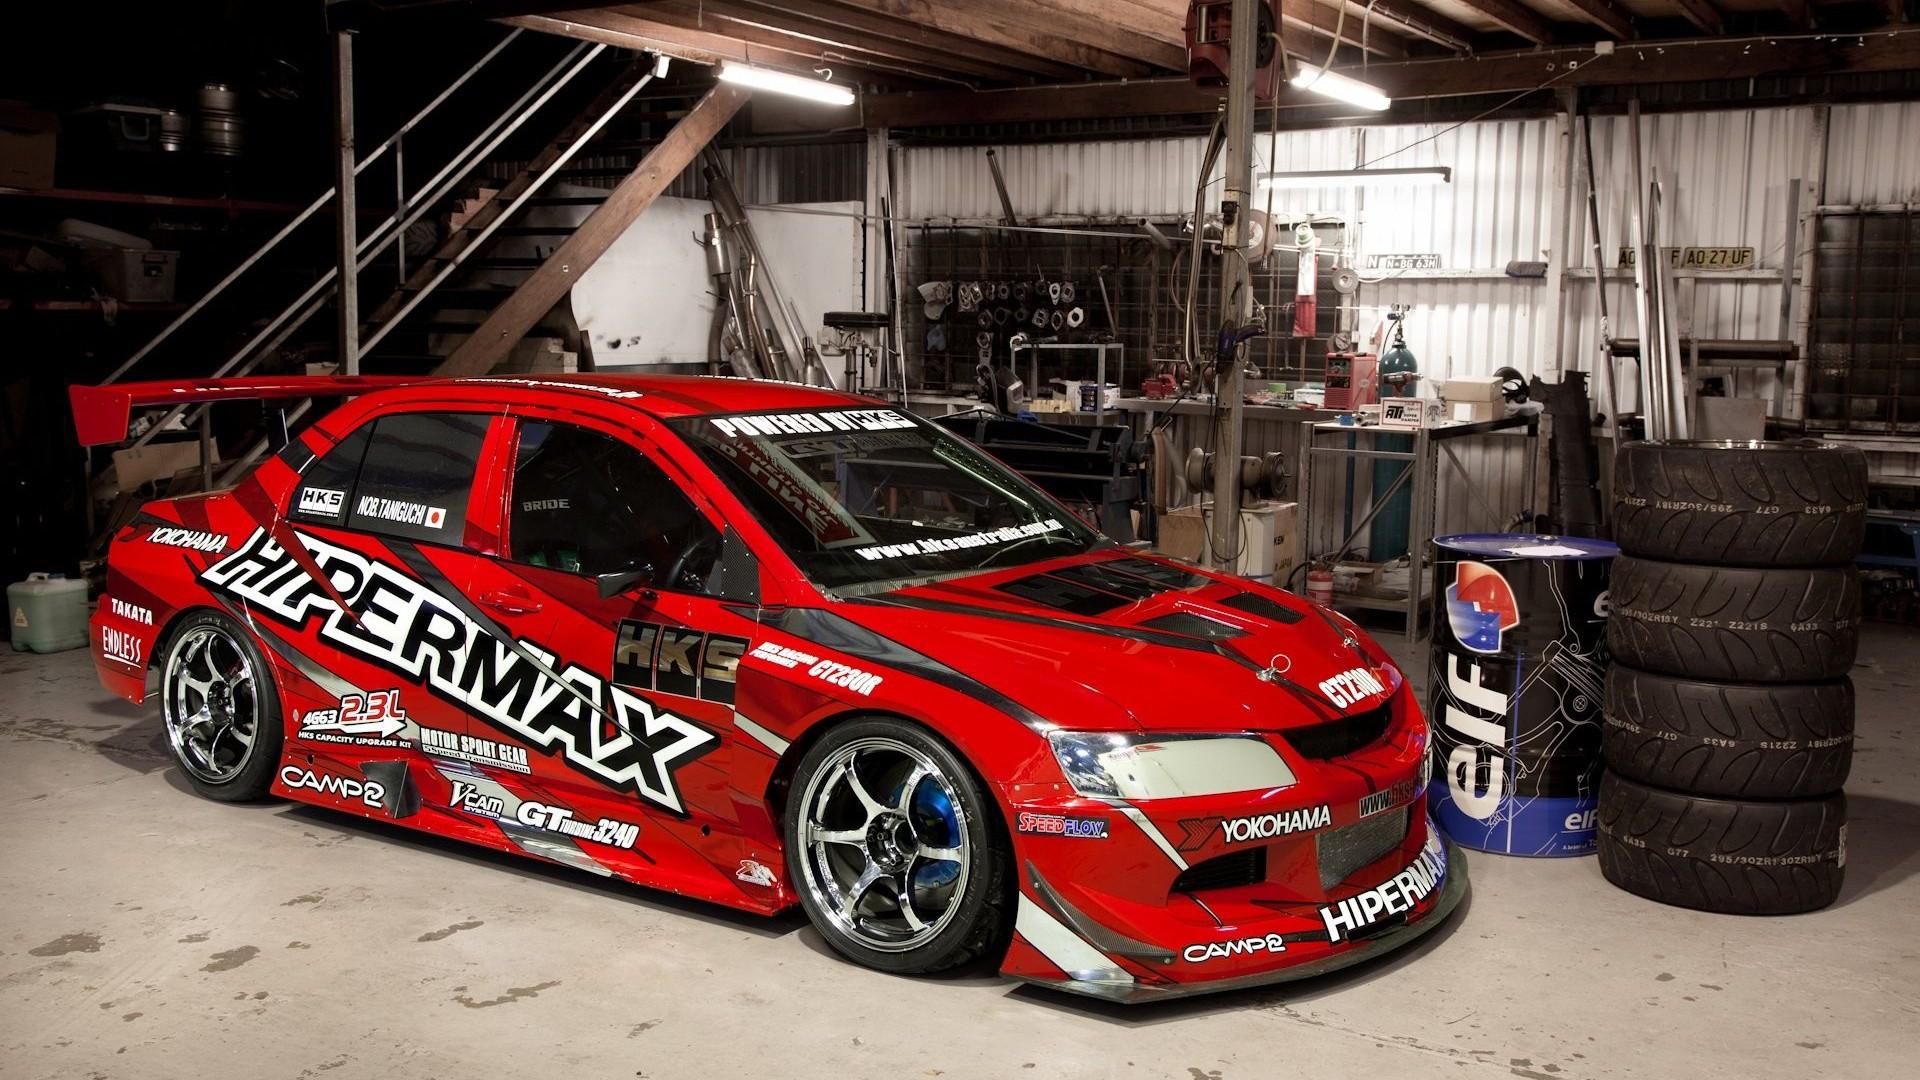 Mitsubishi Lancer Evolution In Garage HD Wallpapers